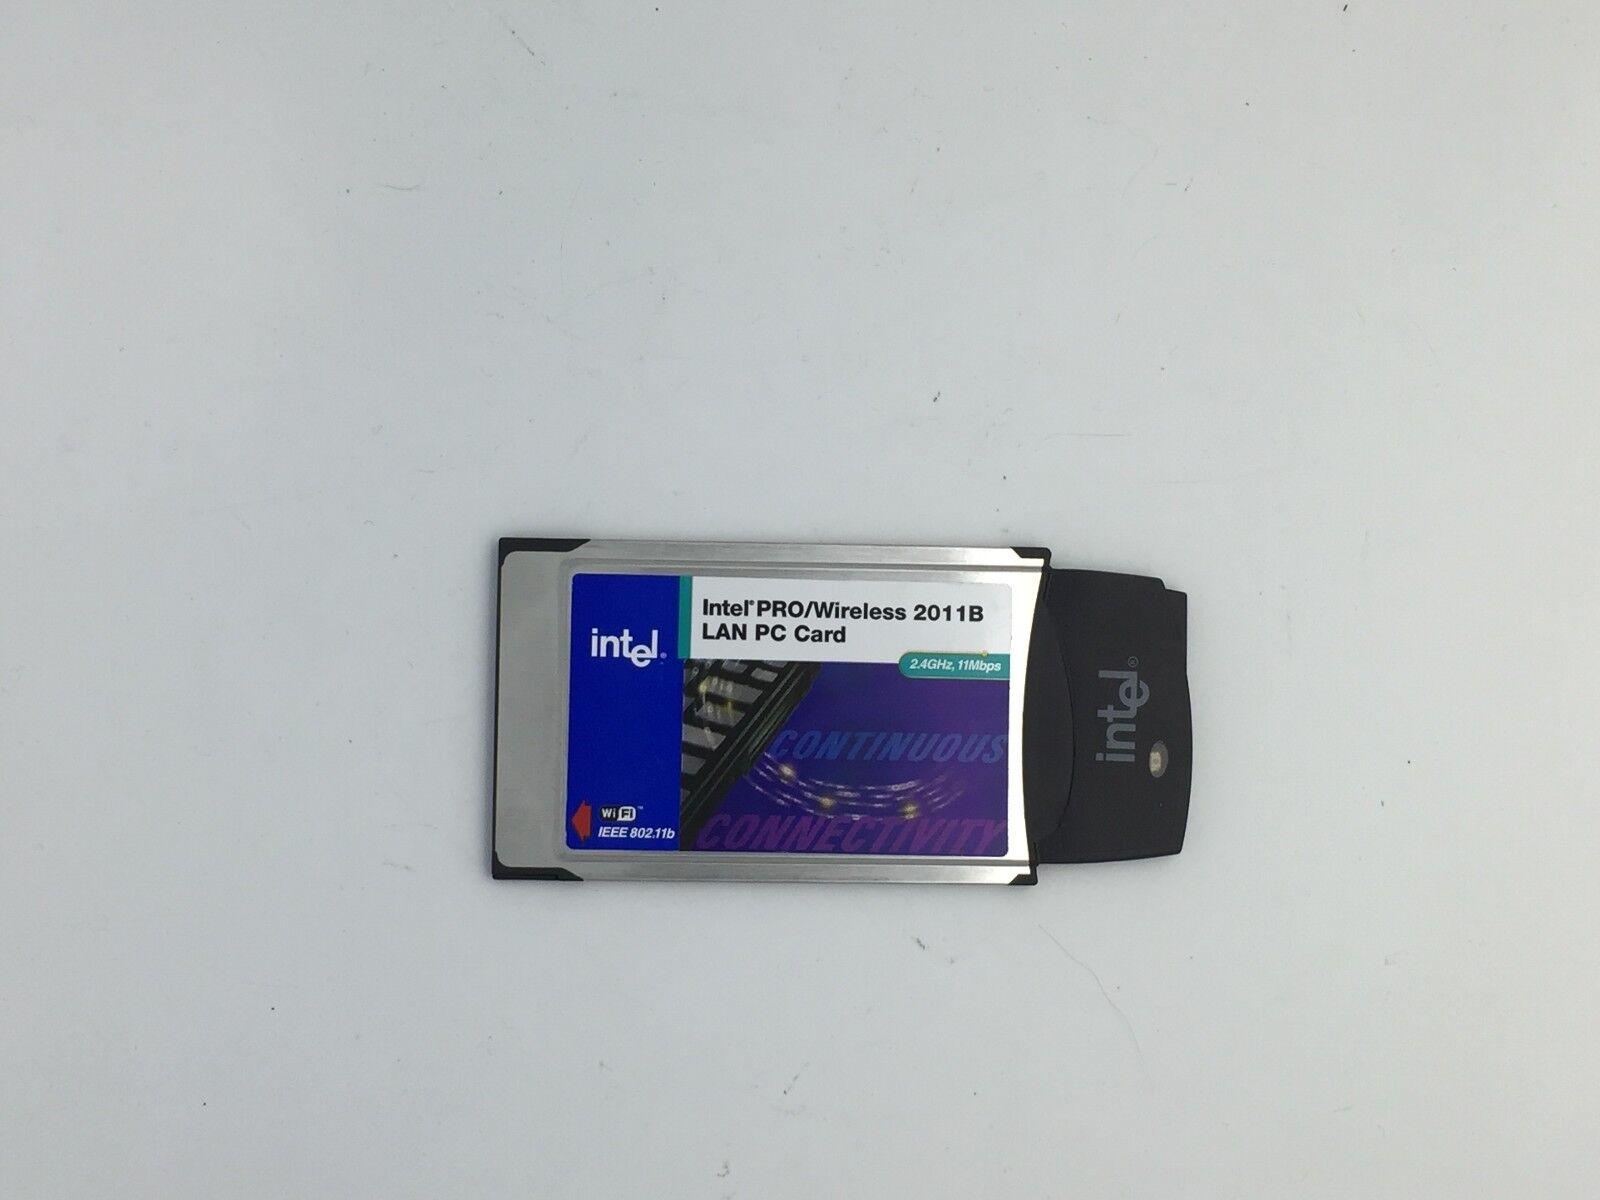 BCM5750 NETXTREME GIGABIT ETHERNET BROADCOM DRIVER CONTROLLER TÉLÉCHARGER